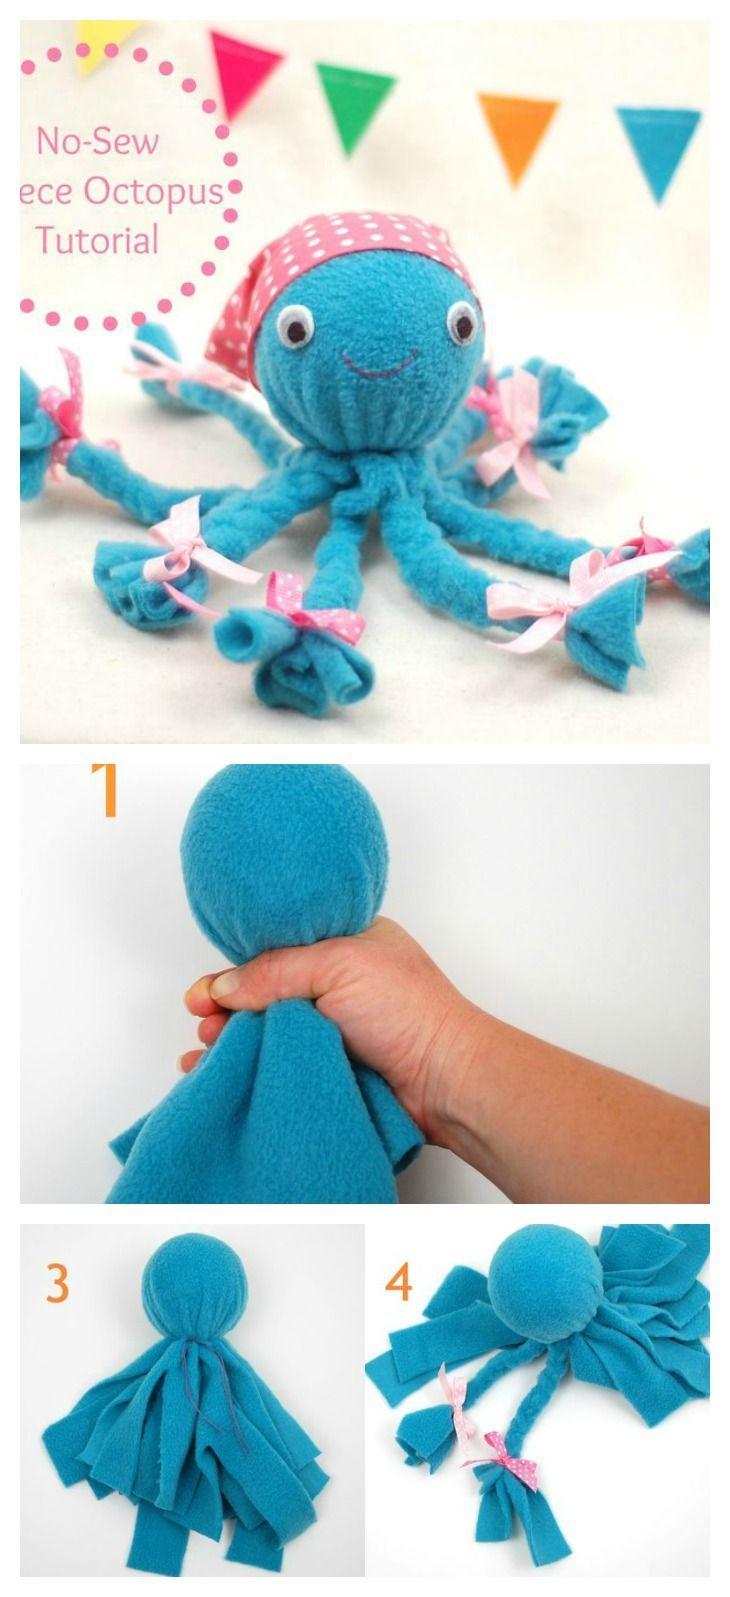 Diy no sew fleece octopus craft octopus crafts craft for Easy diy arts and crafts